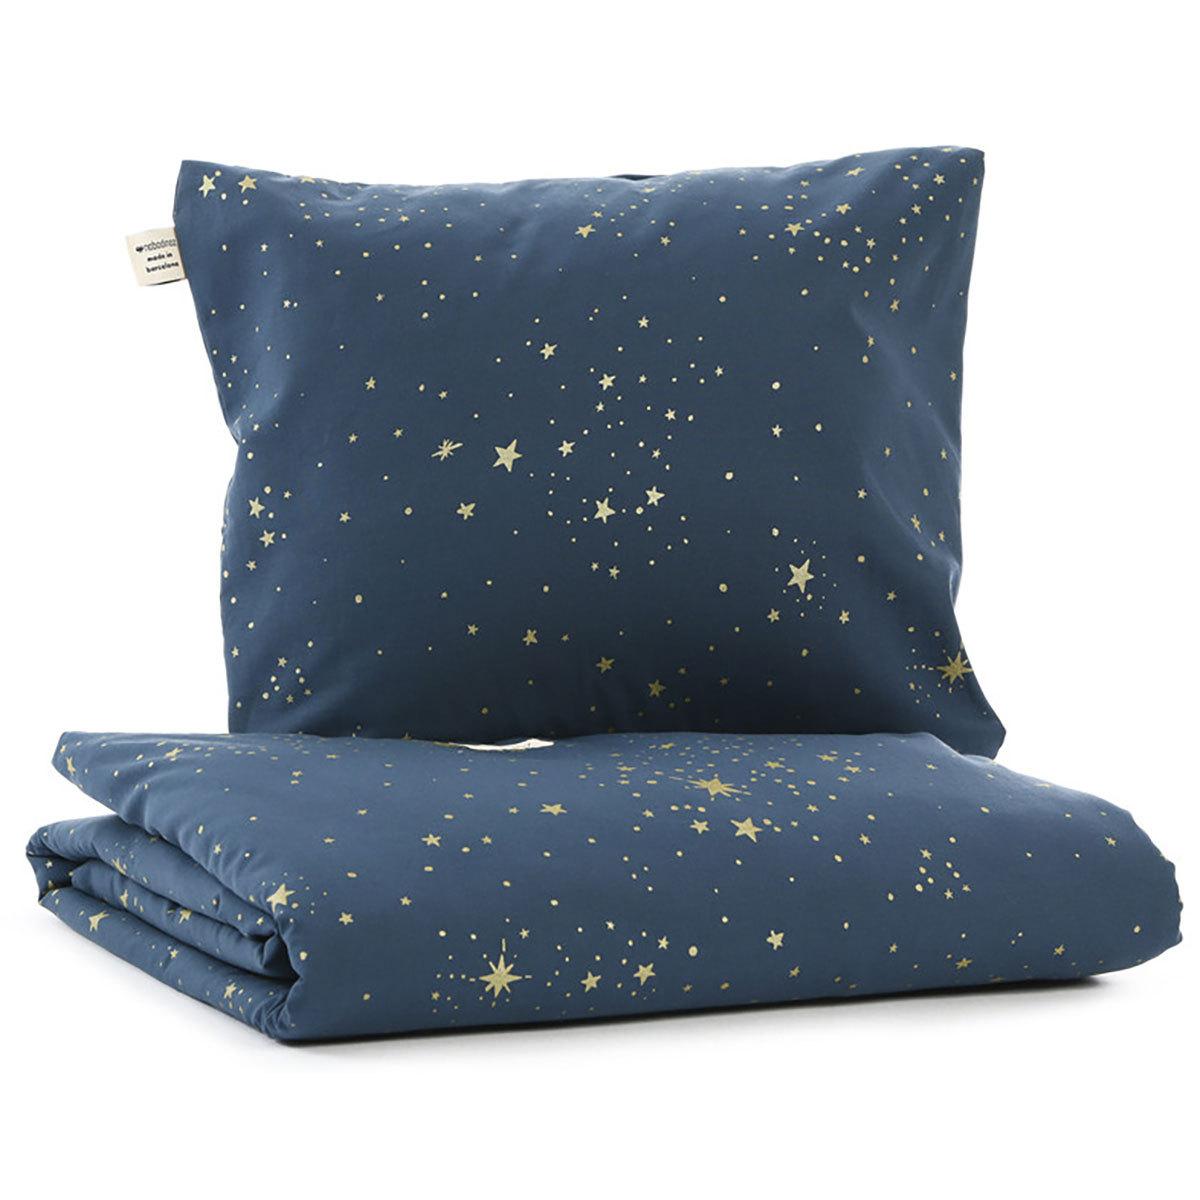 Linge de lit Parure de Lit Himalaya Gold Stella & Night Blue - 140 x 200 cm Nobodinoz - AR201911220085